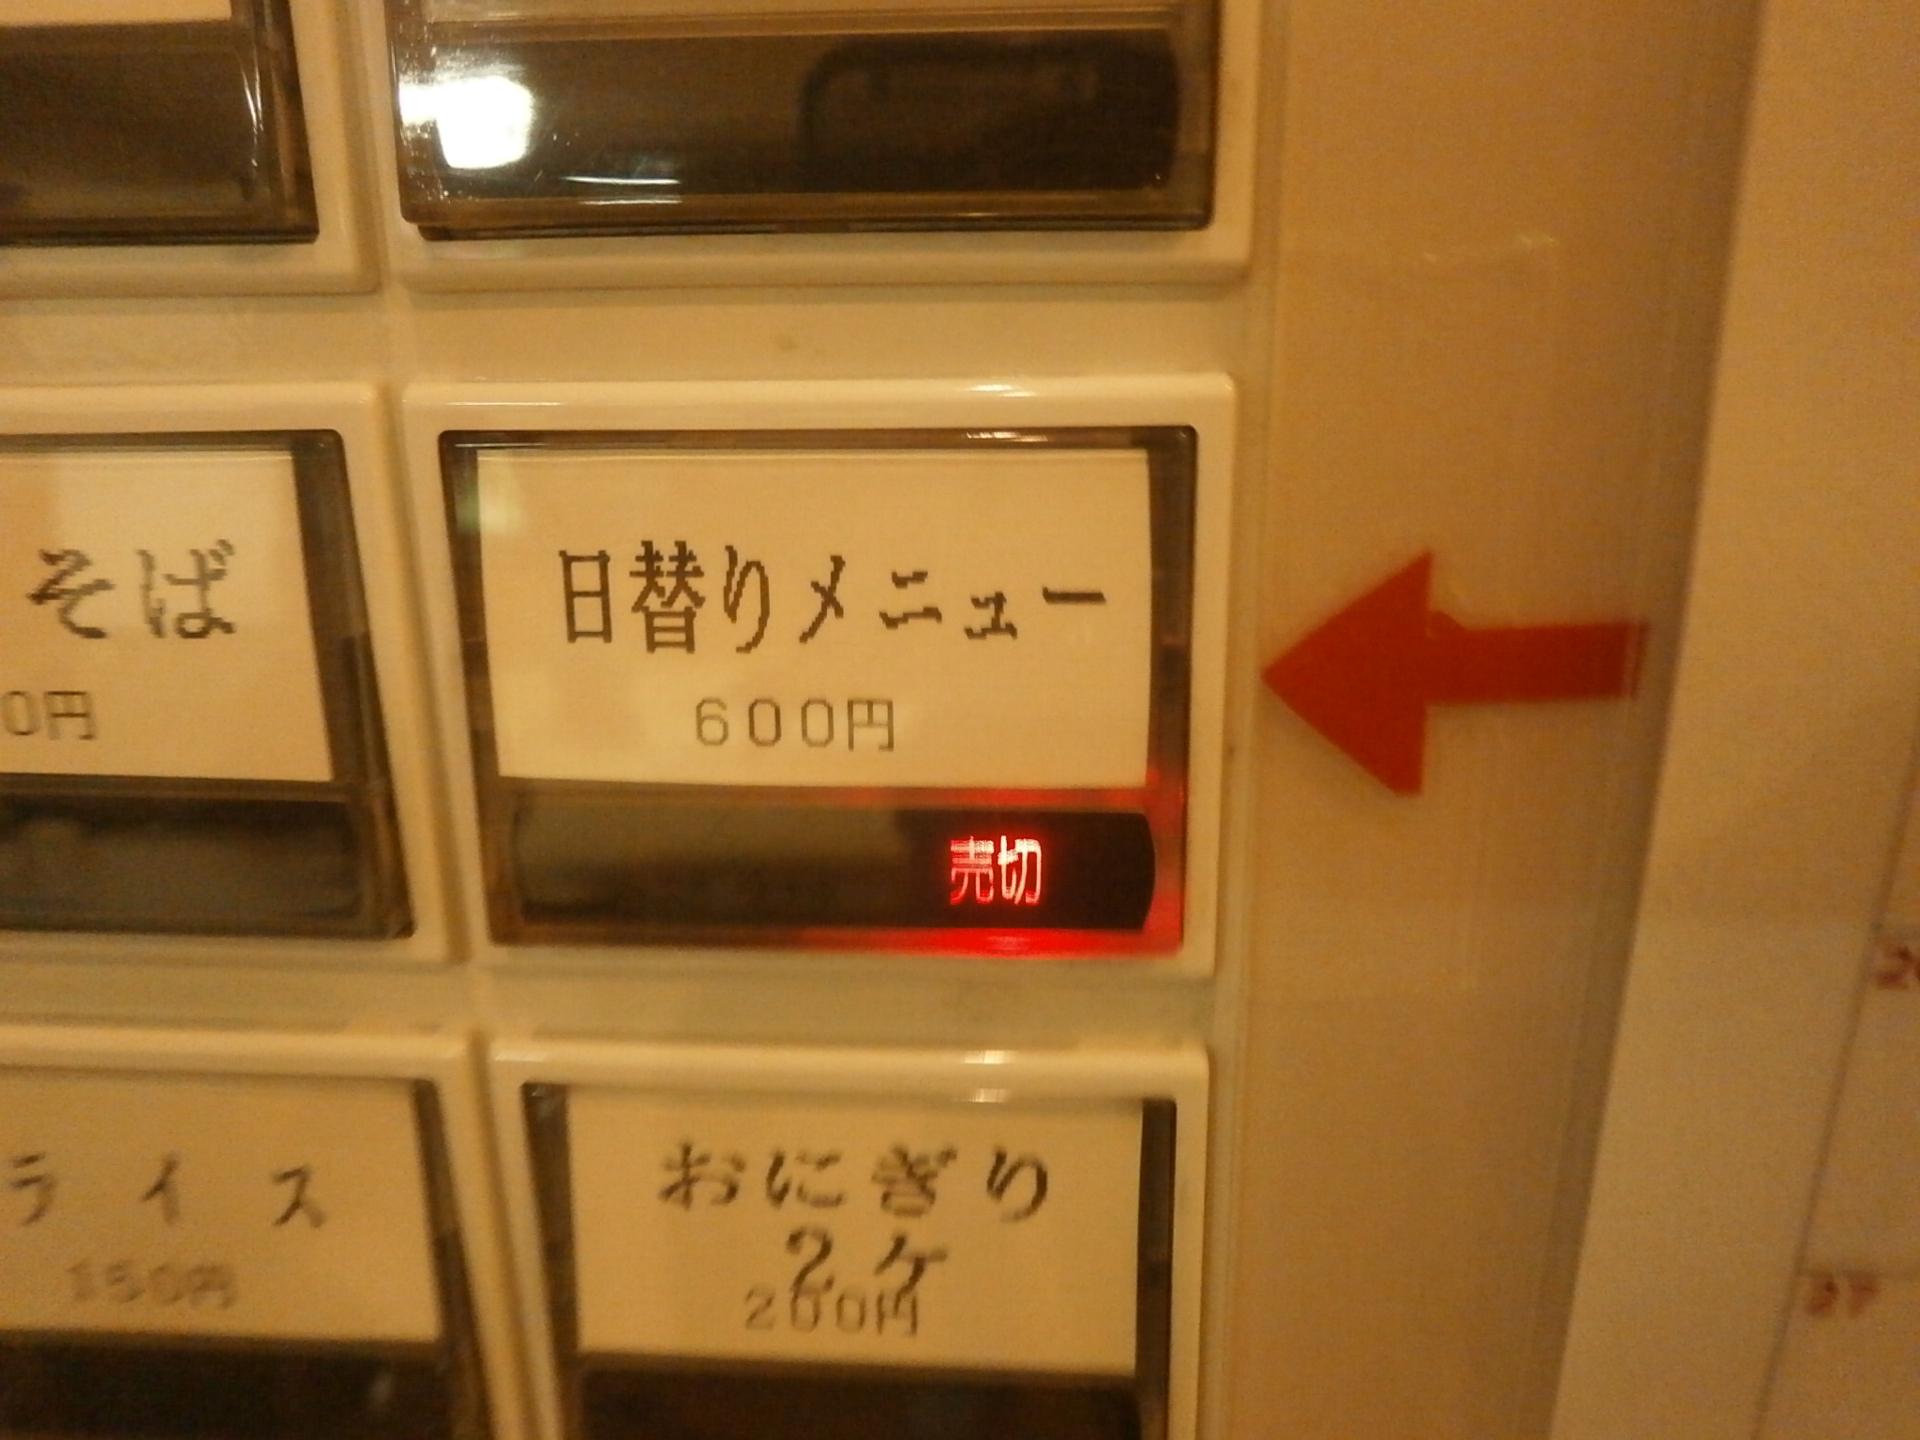 PC120327.jpg